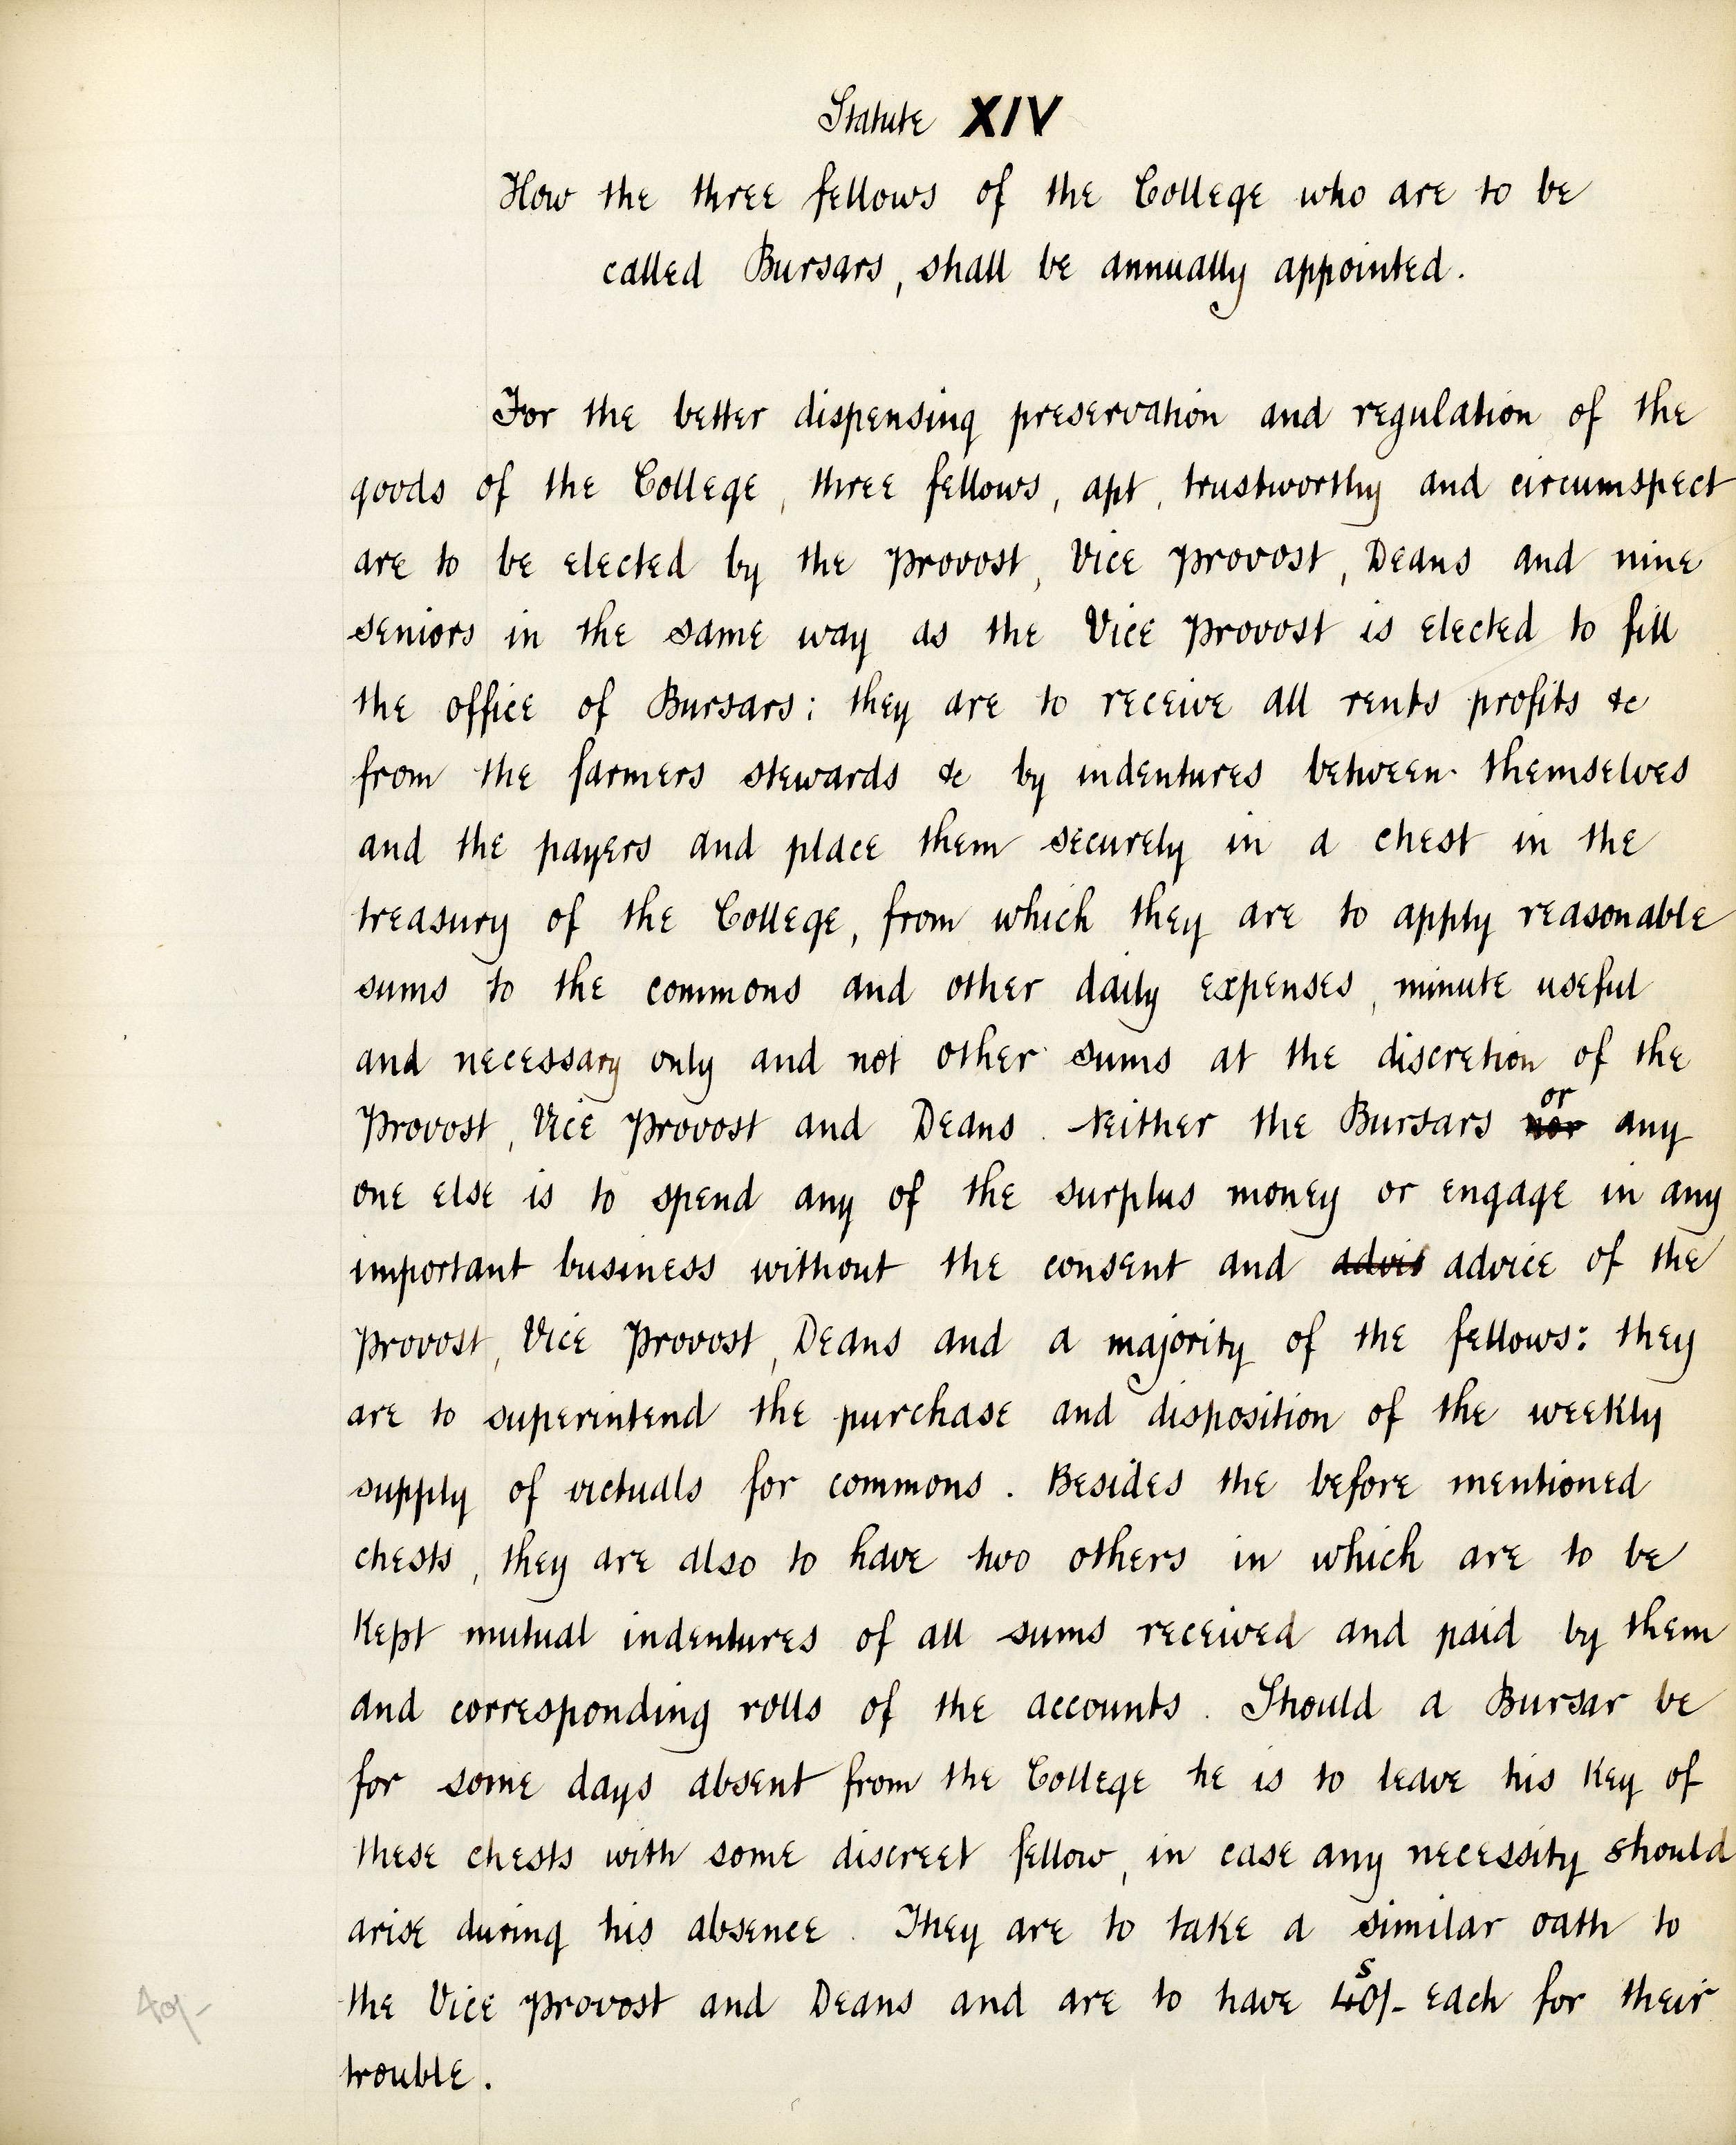 Founder's statute XIV, translated by T. Brocklebank (transcribed by F.L.Clarke) (KCS/69)